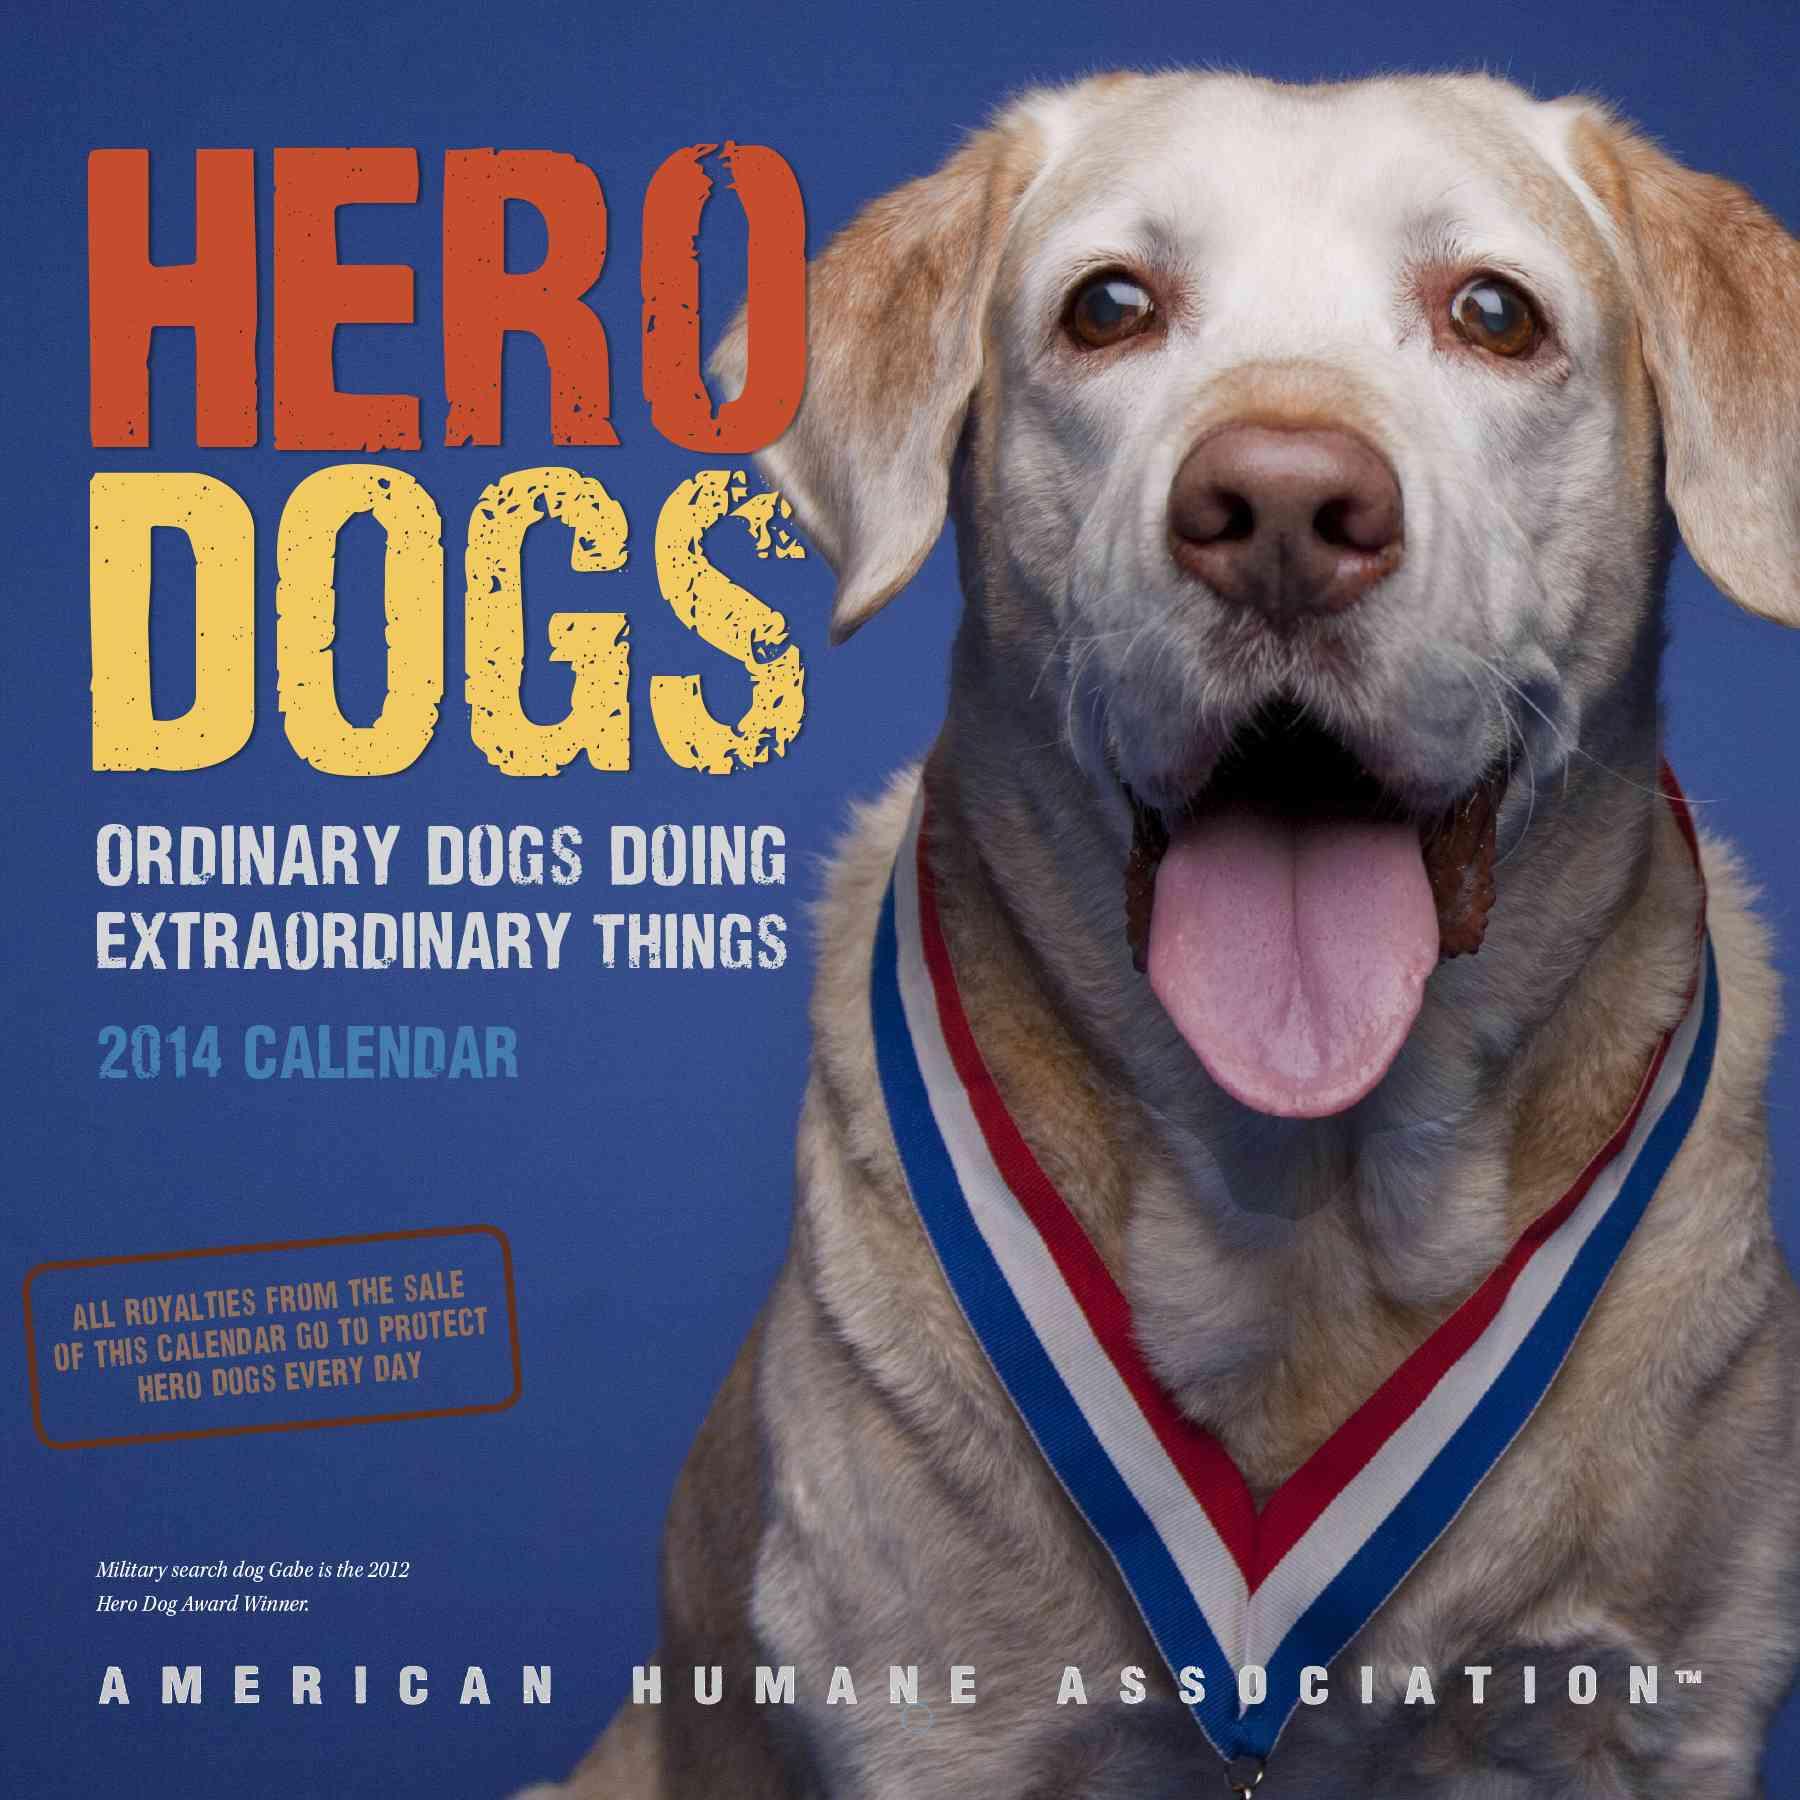 Hero Dogs 2014 Calendar: Ordinary Dogs Doing Extraordinary Things (Calendar)